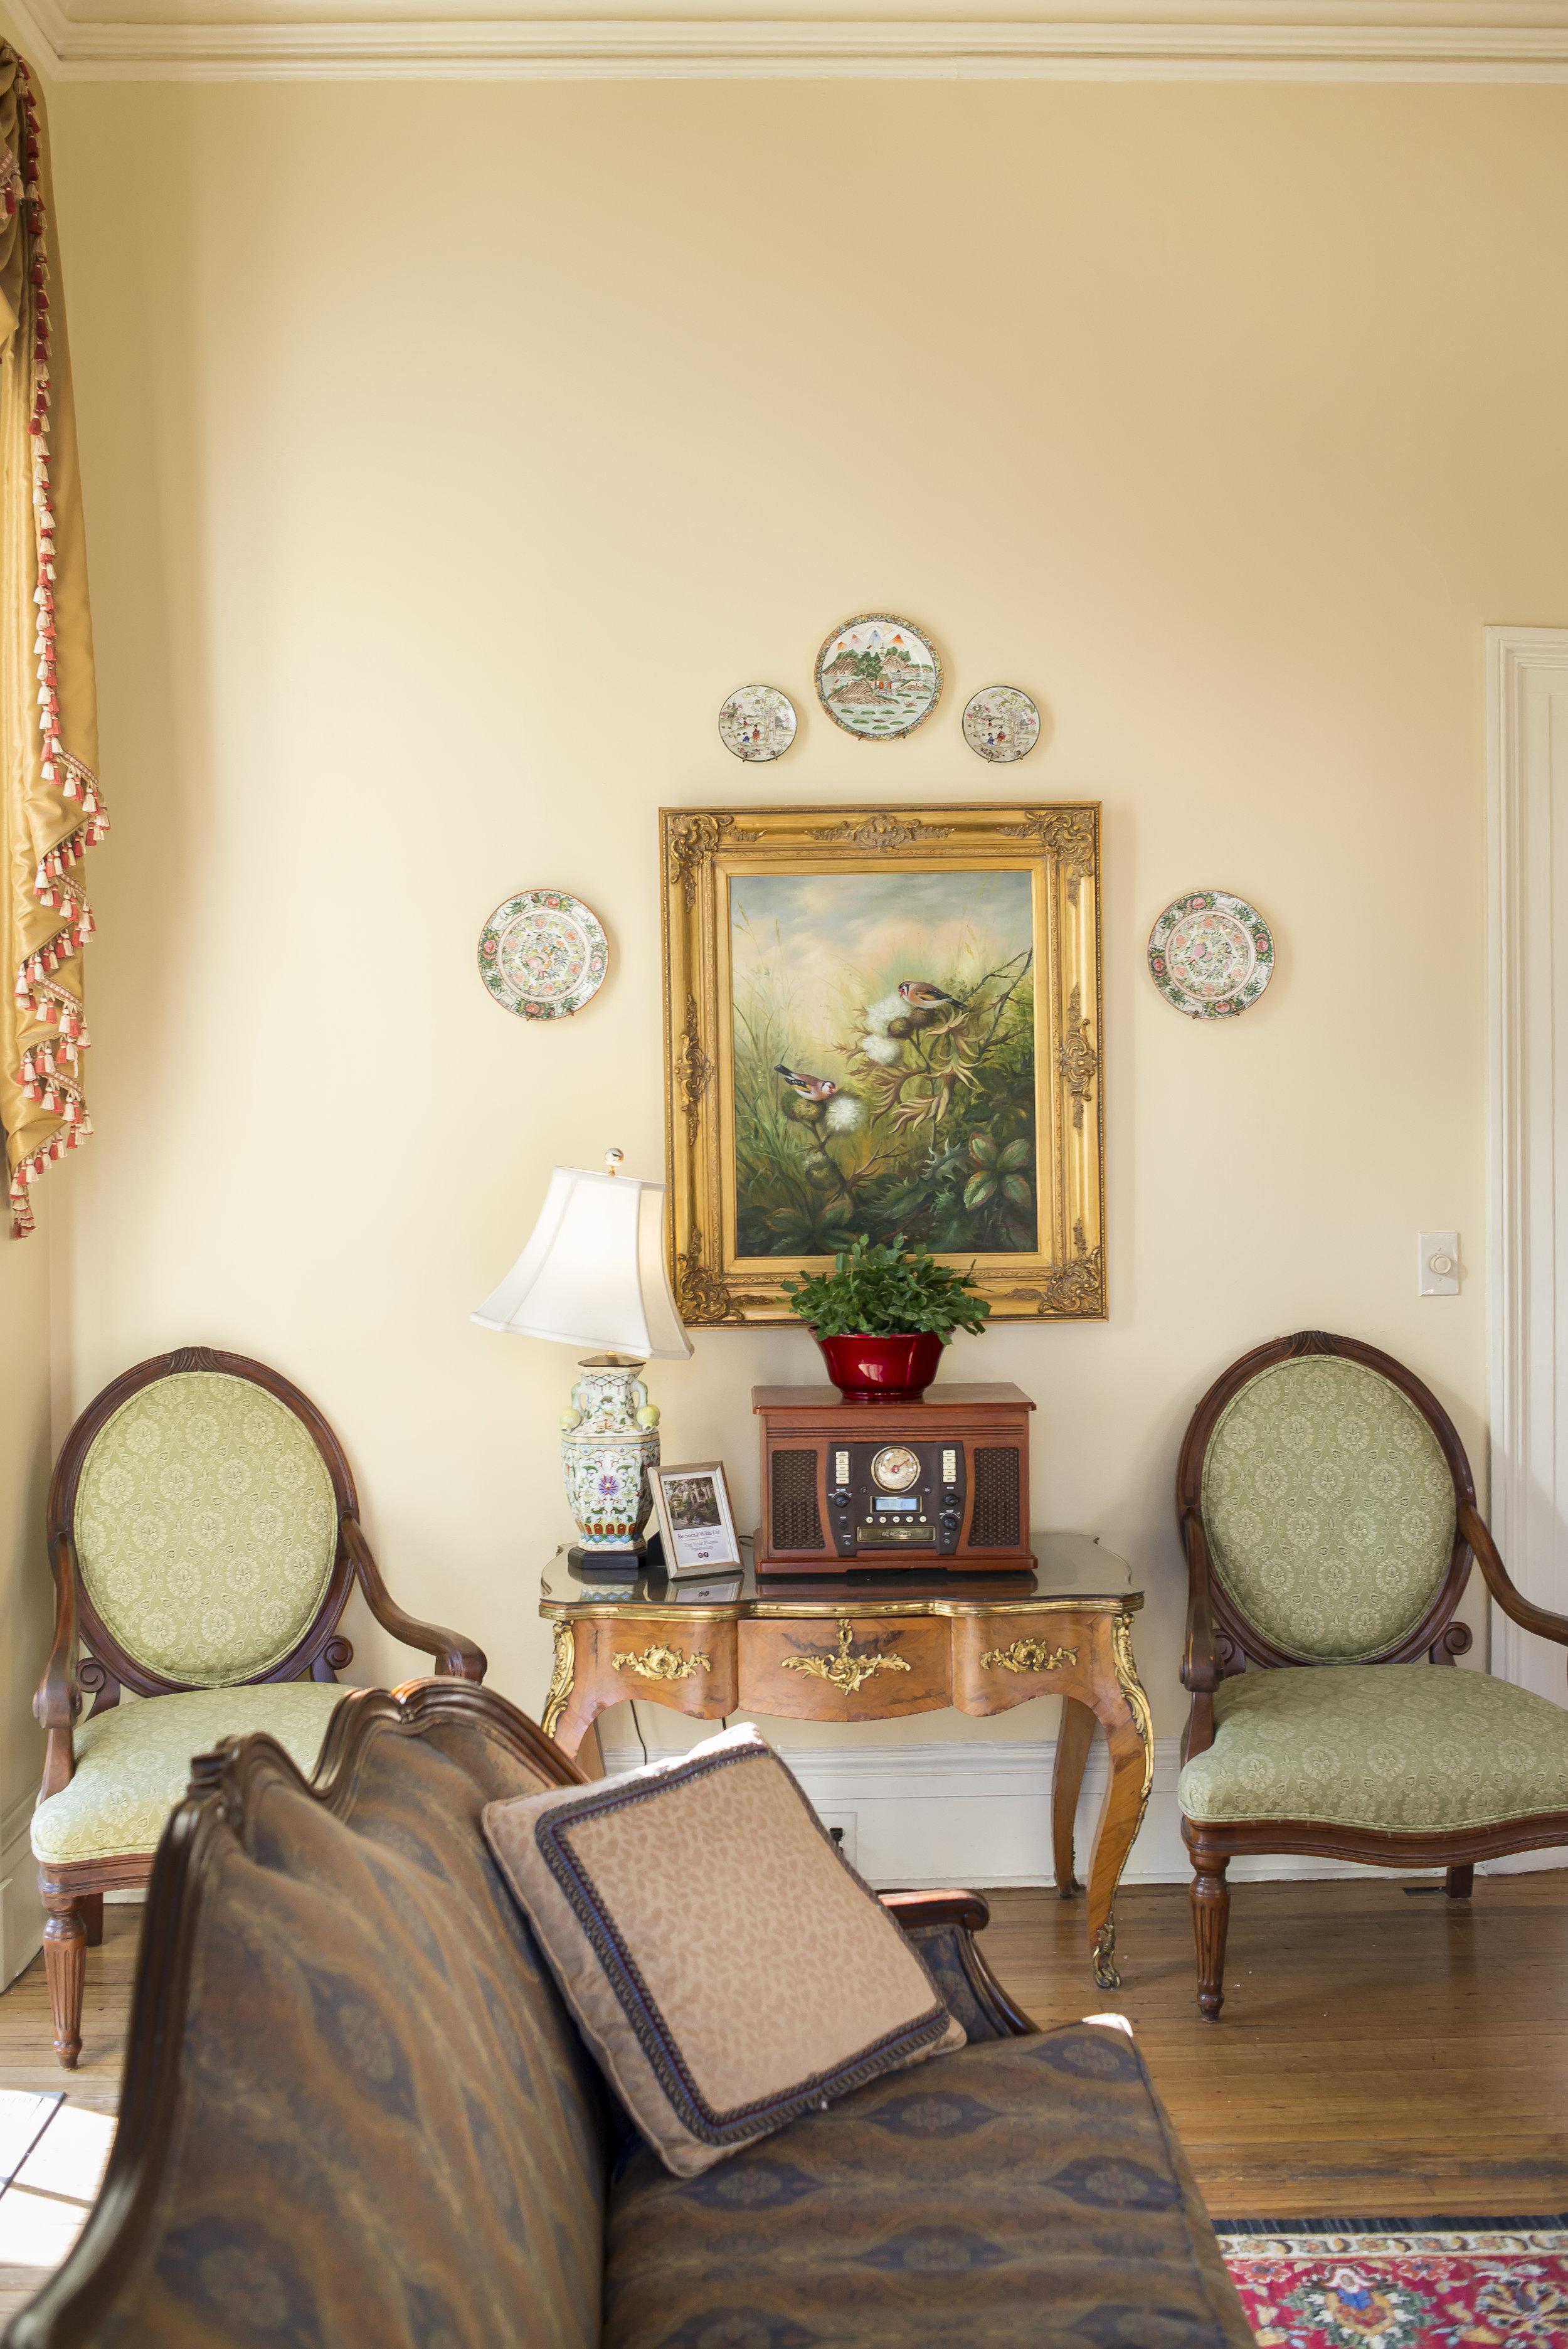 Parlor inside the Ballastone Inn, Savannah, GA | Genteel & Bard